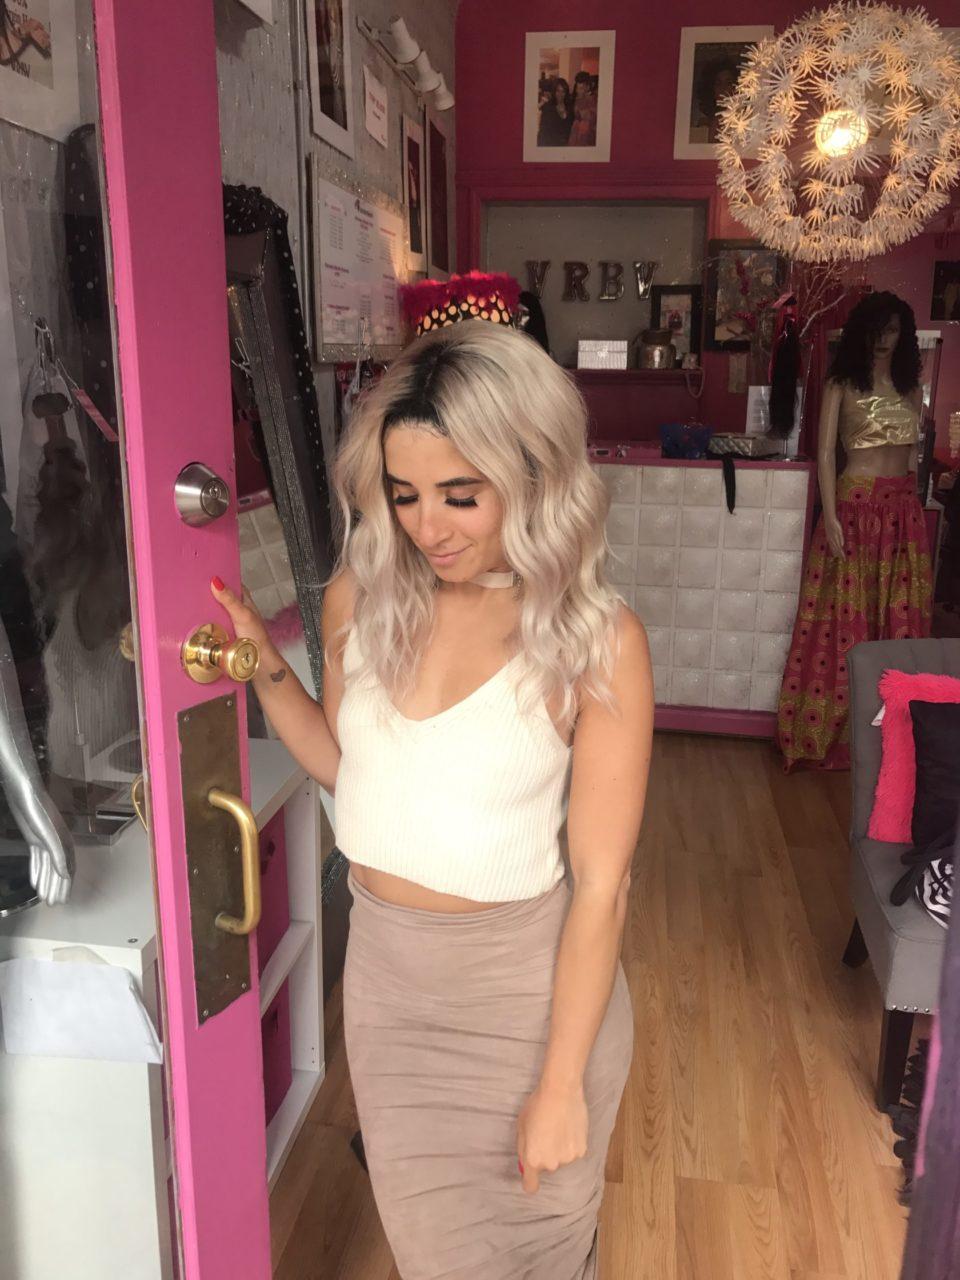 #JCSpot: Virgin Remy by Vanessa Hair Shop